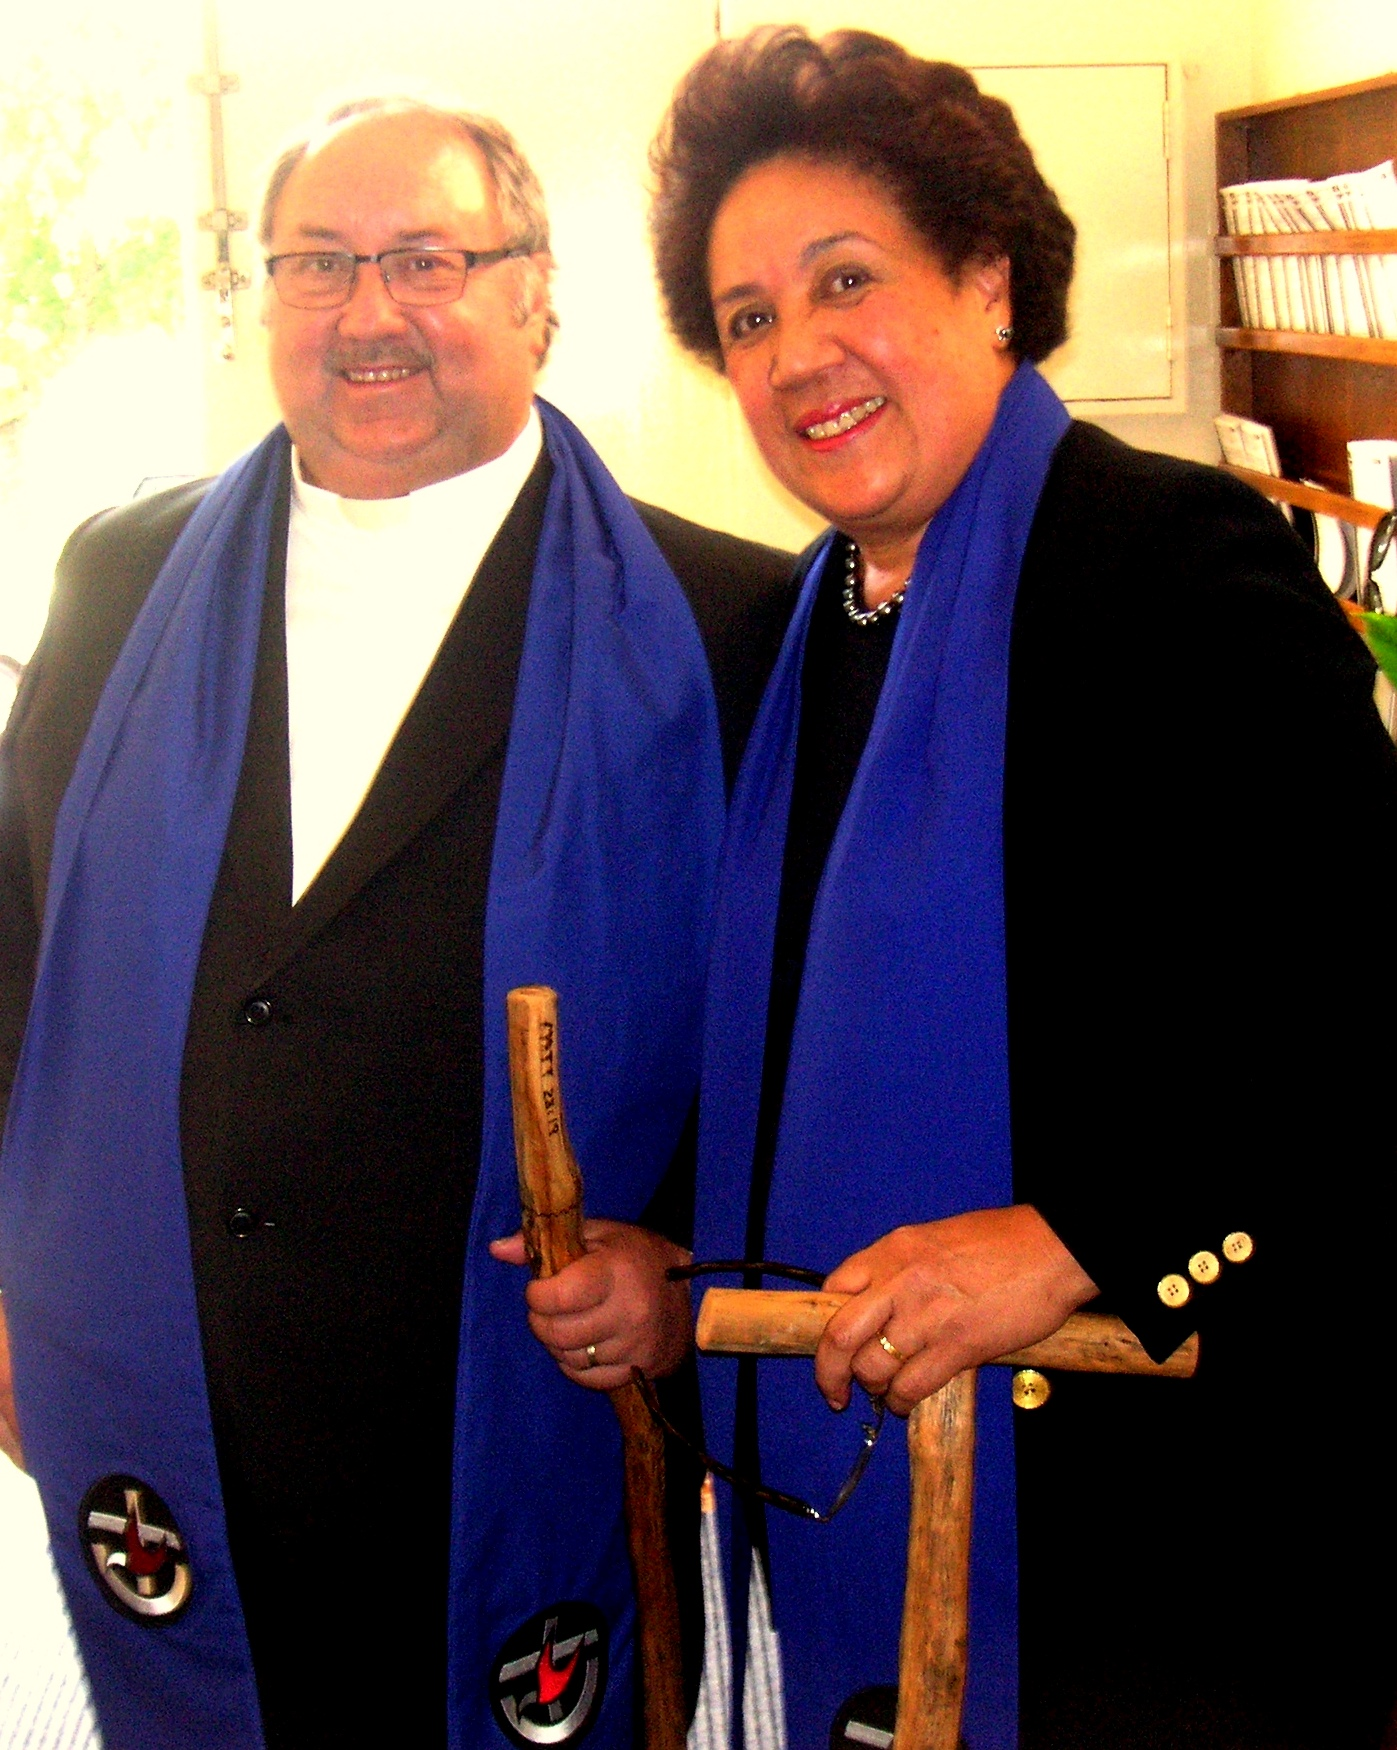 Rev.stephen%20&%20rev.dr.mele%20ratcliffe original